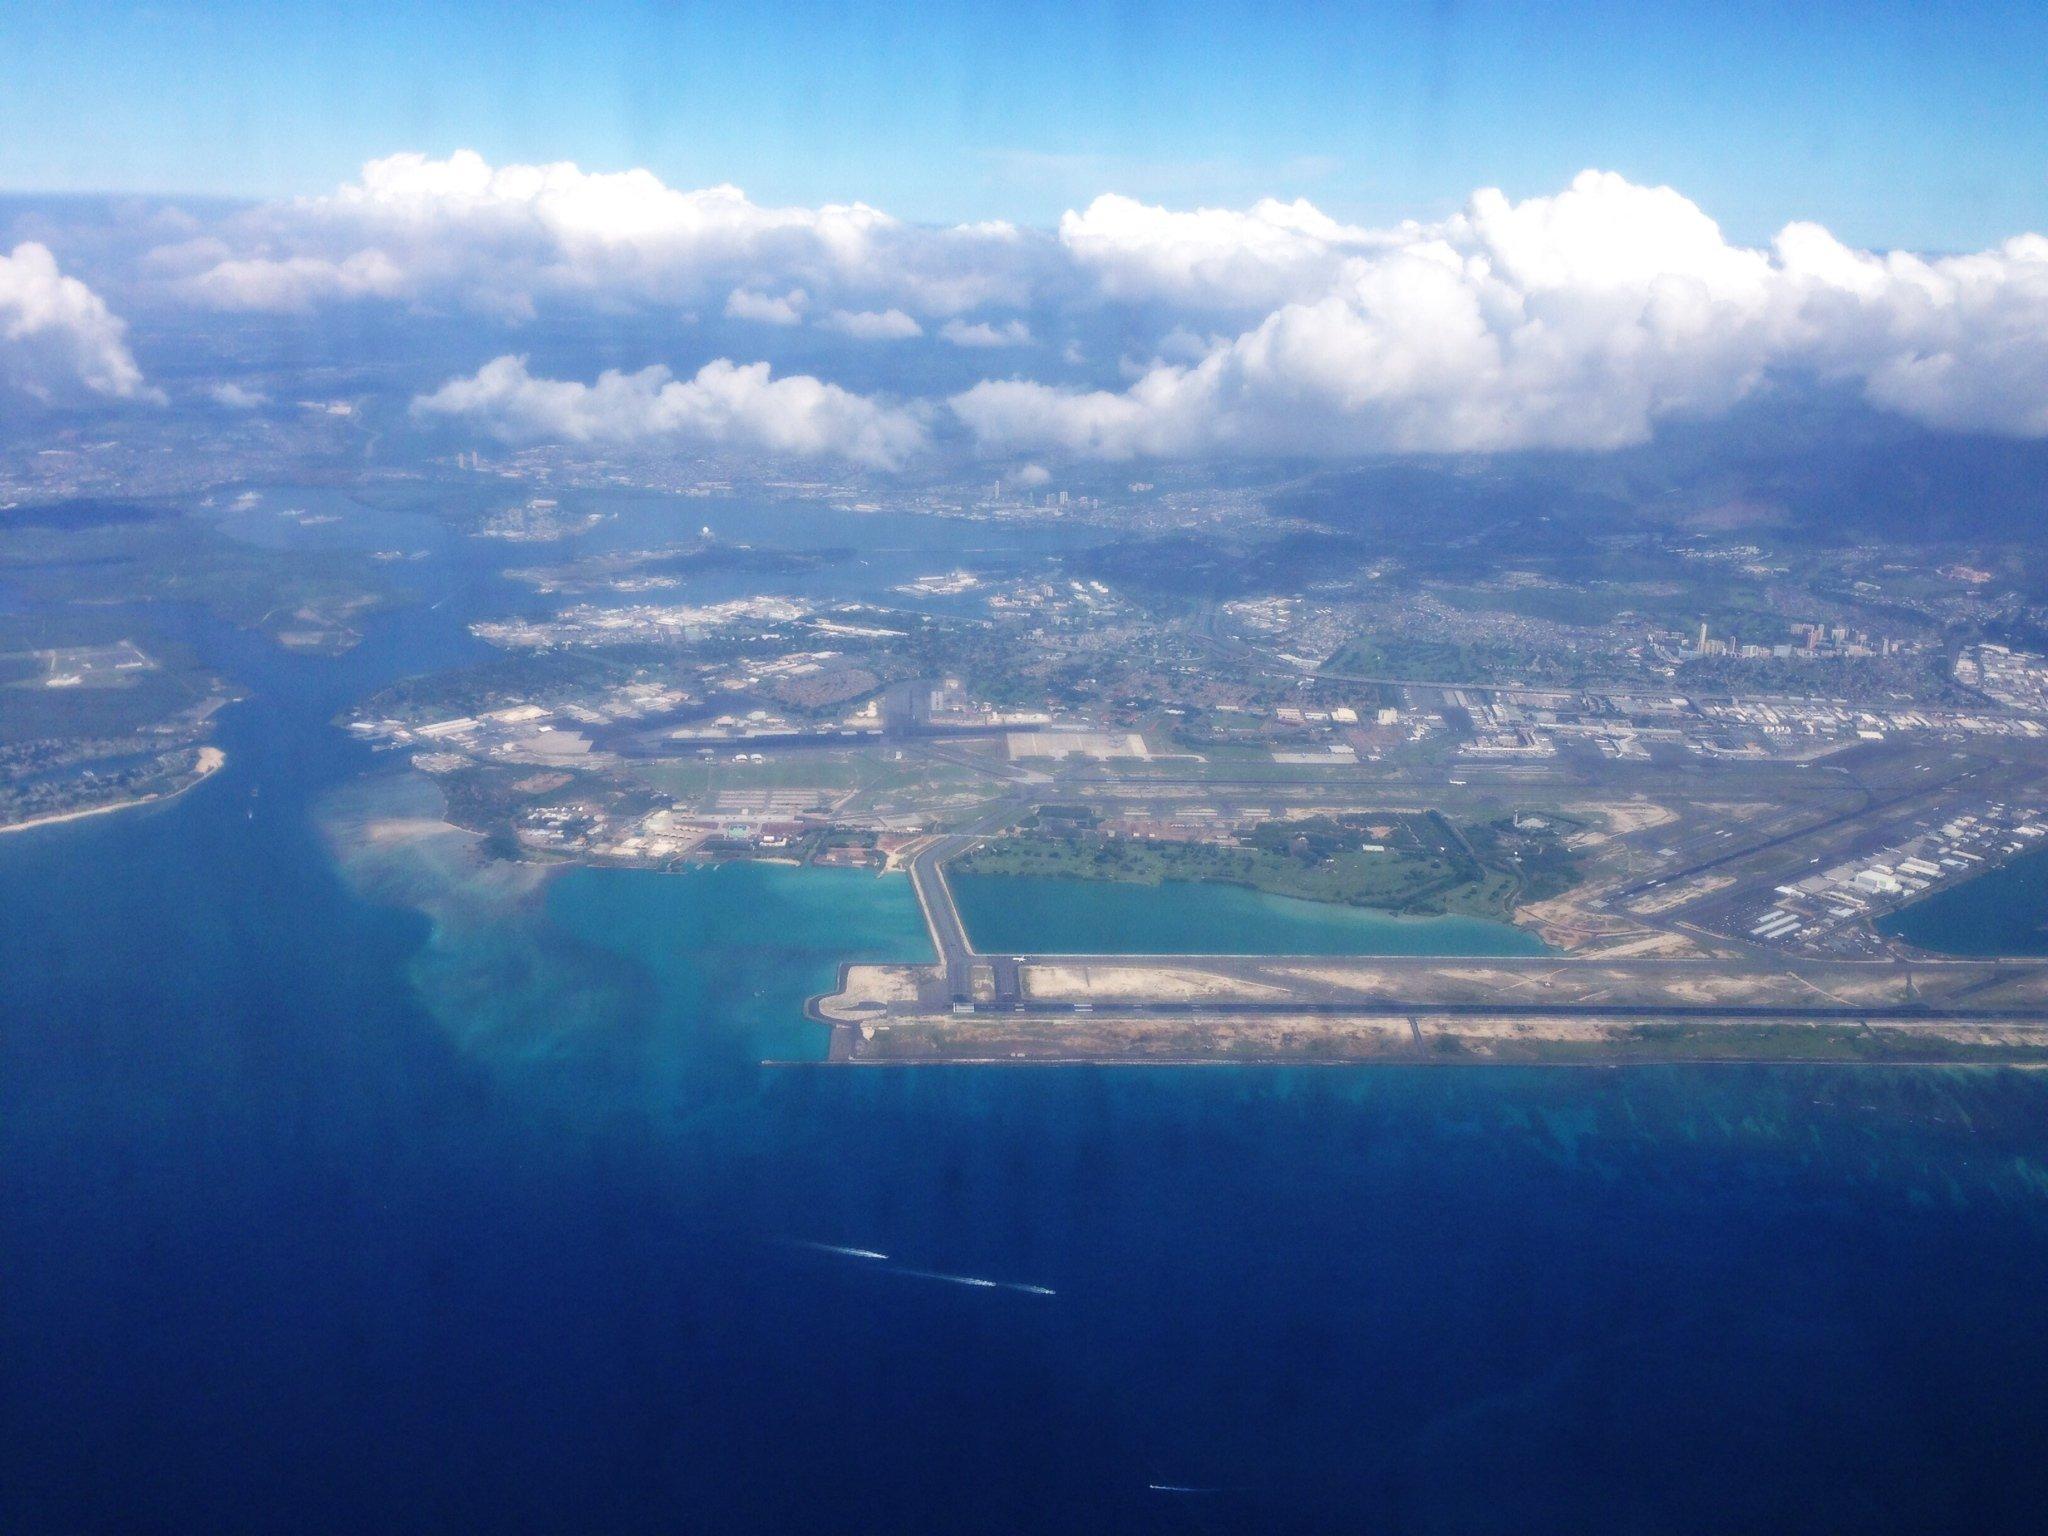 Hawaii here we come!